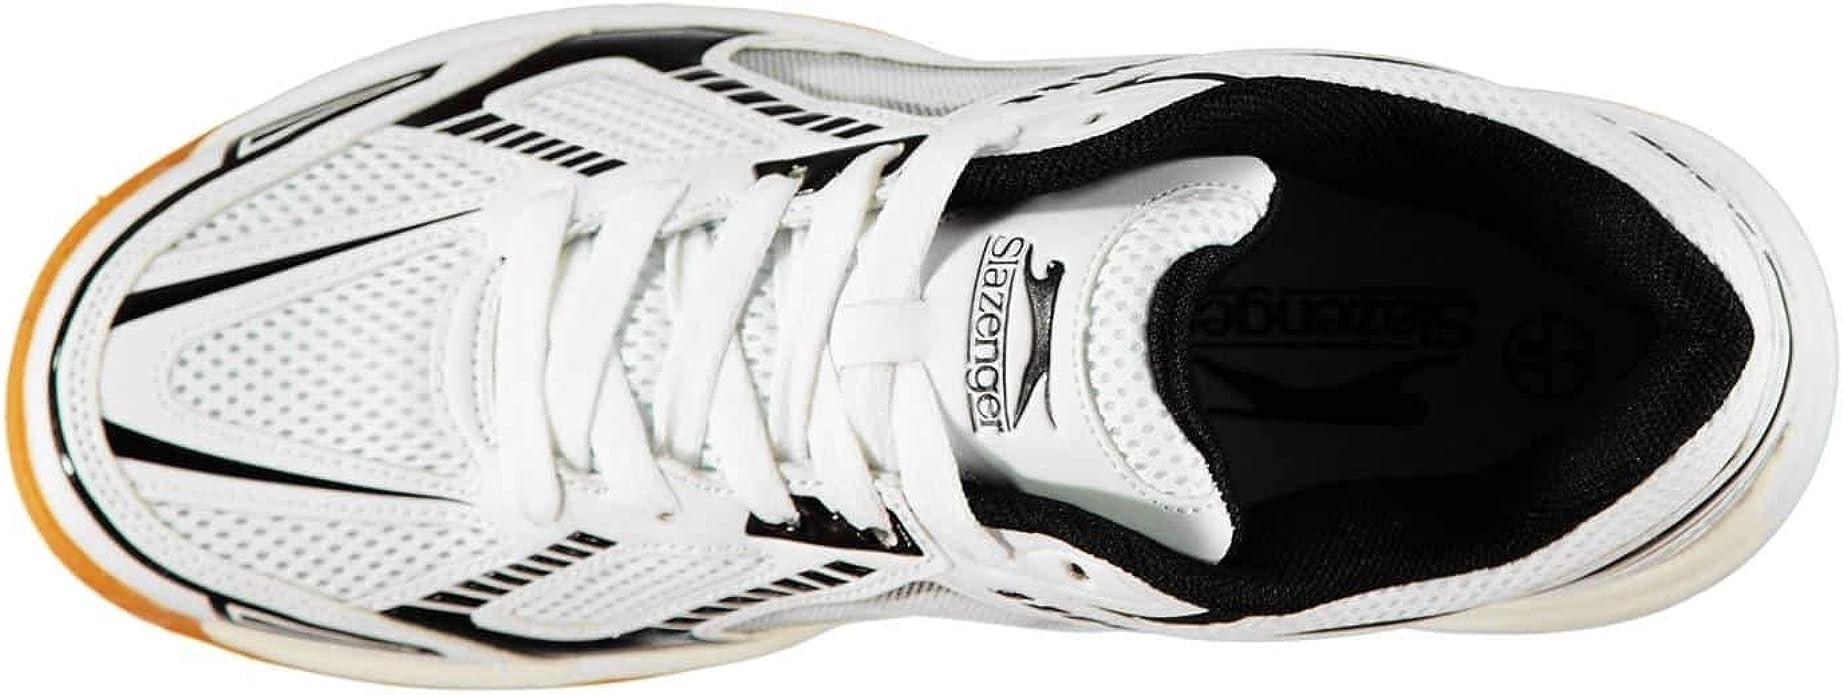 Scarpe da Ginnastica da Uomo Slazenger Indoor Scarpe Sportive